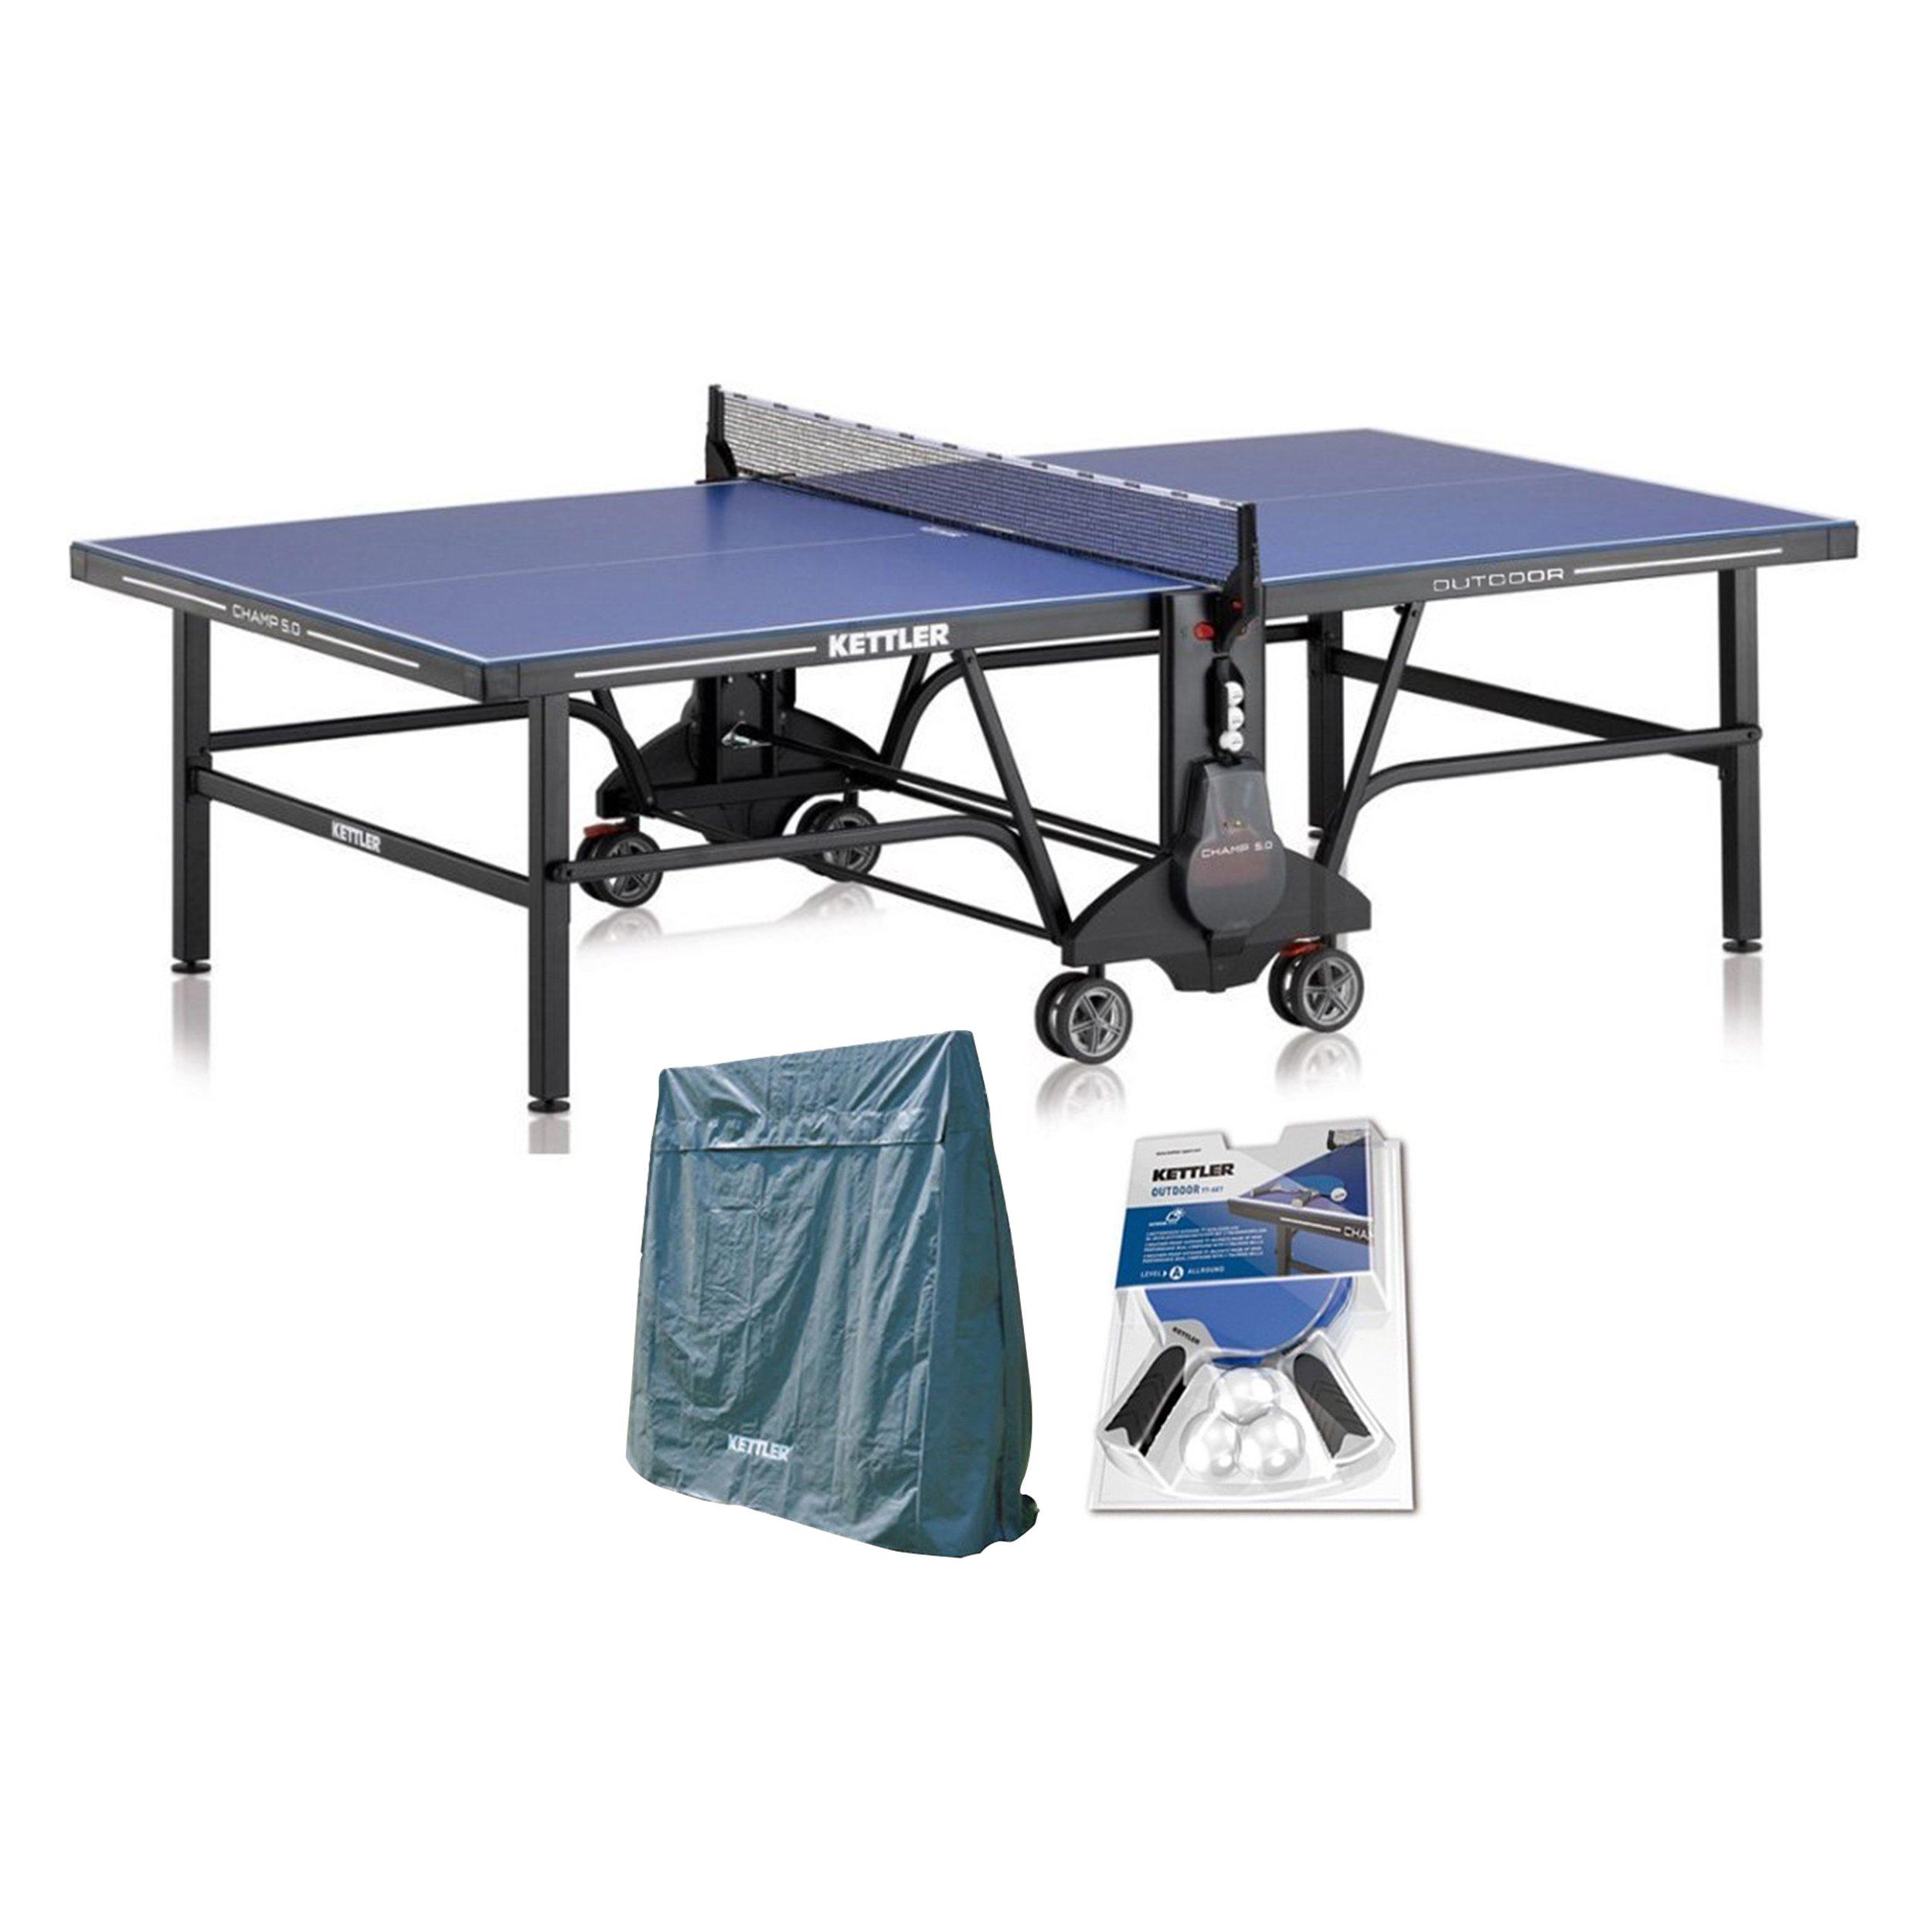 Kettler Outdoor Tennis Accessory Bundle